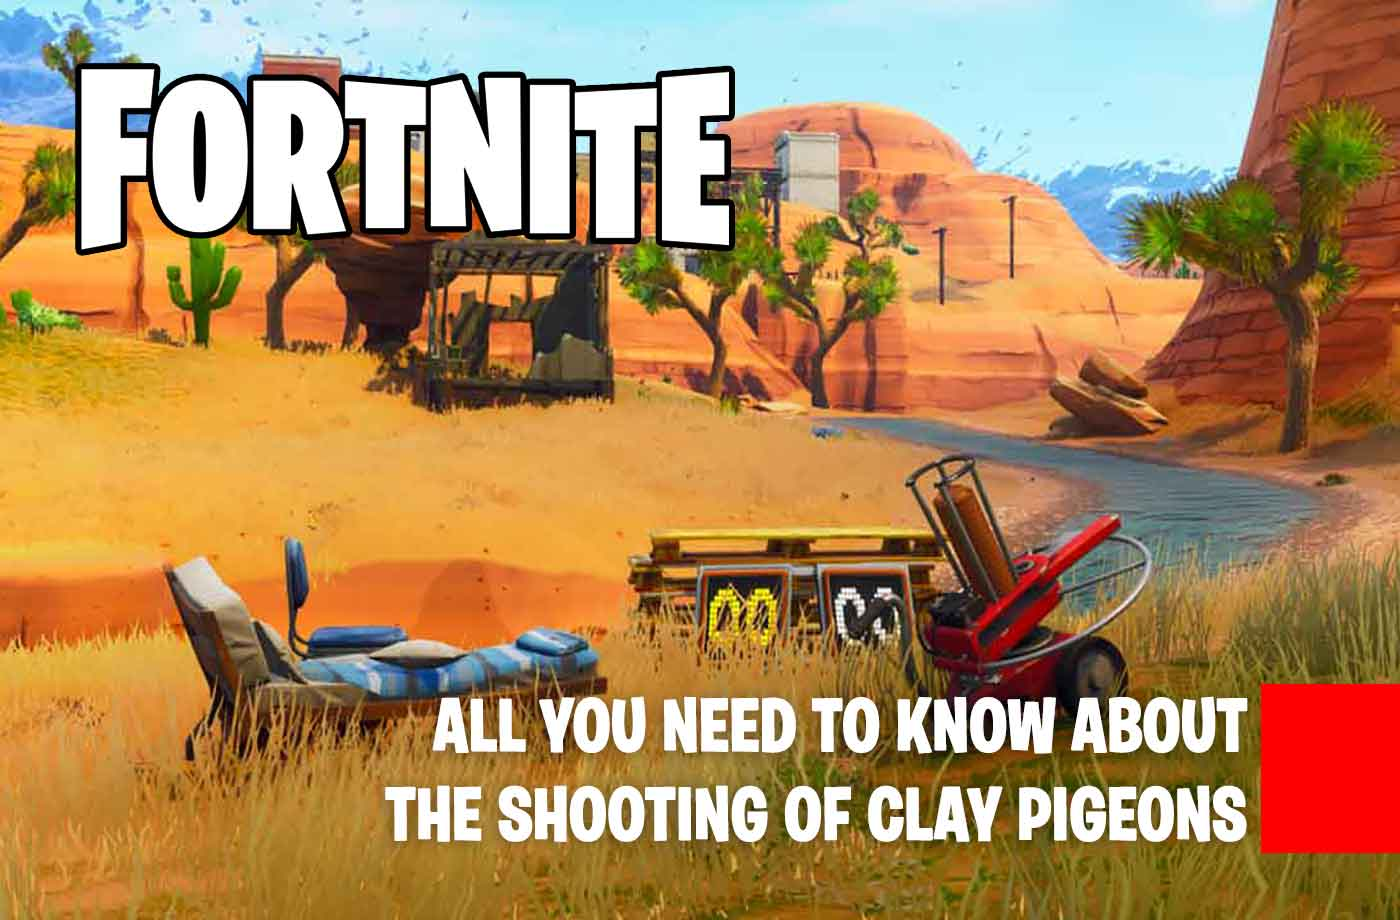 Challenge Fortnite How To Shoot Clay Pigeons Week 3 Season 5